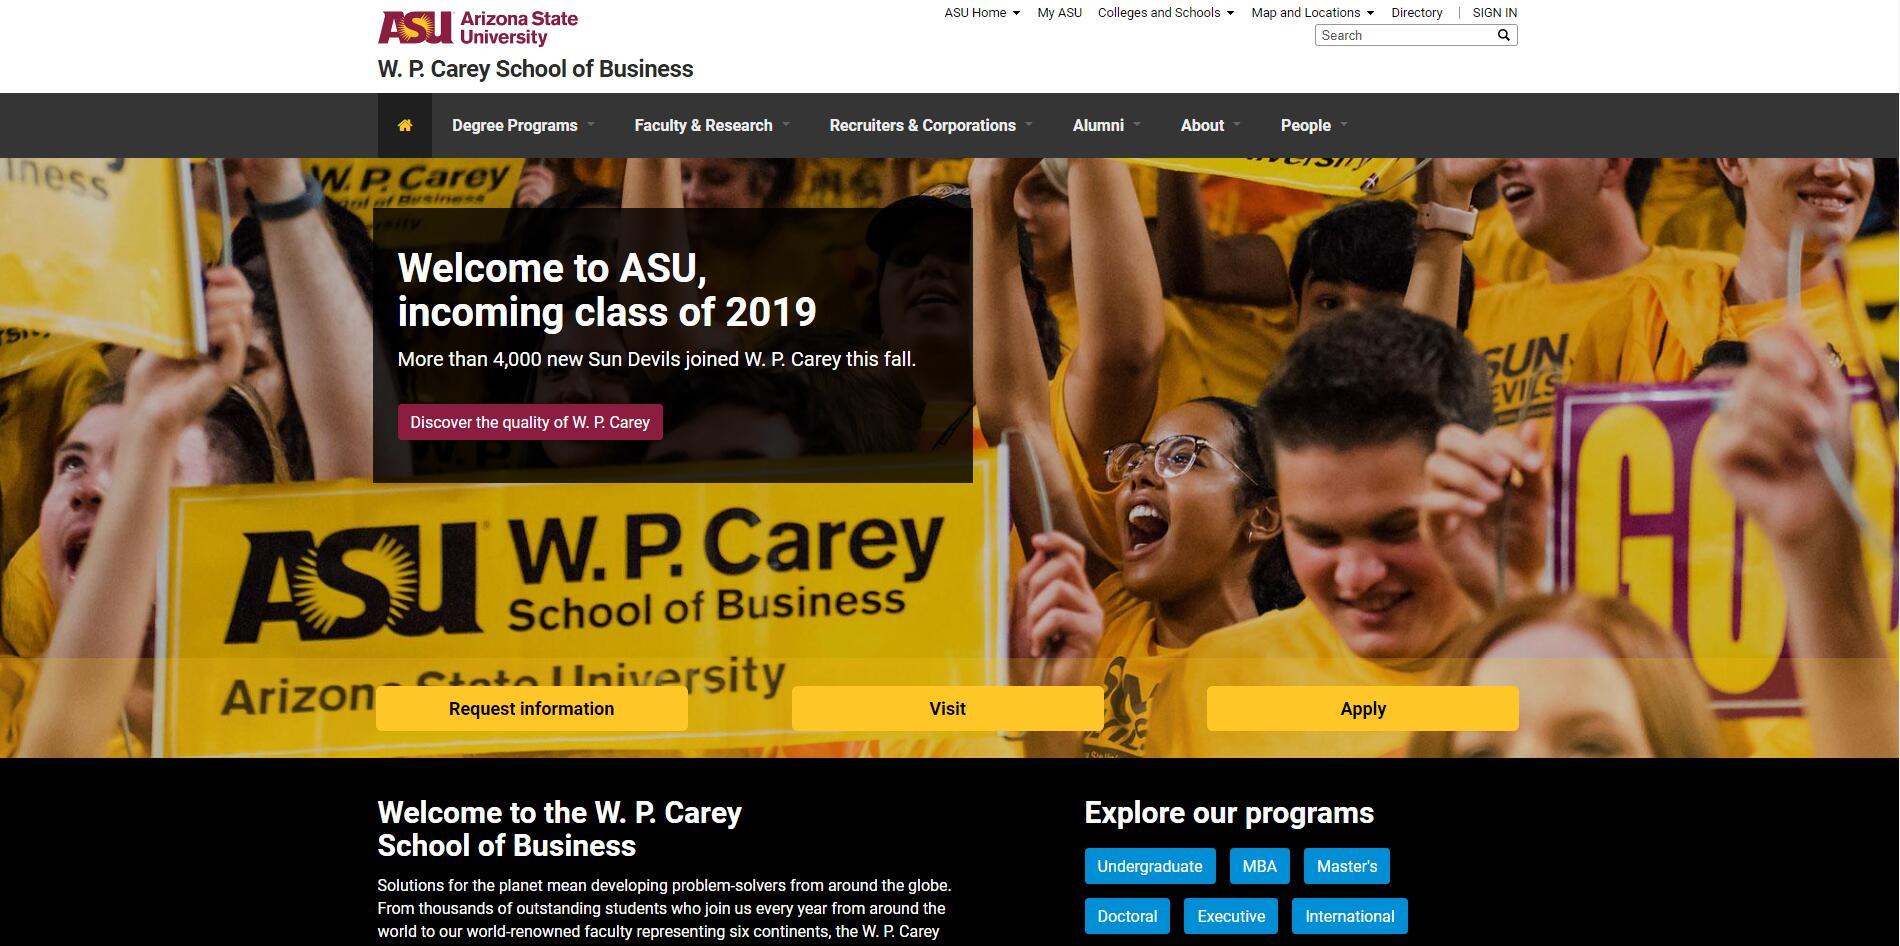 The W. P. Carey School of Business at Arizona State University